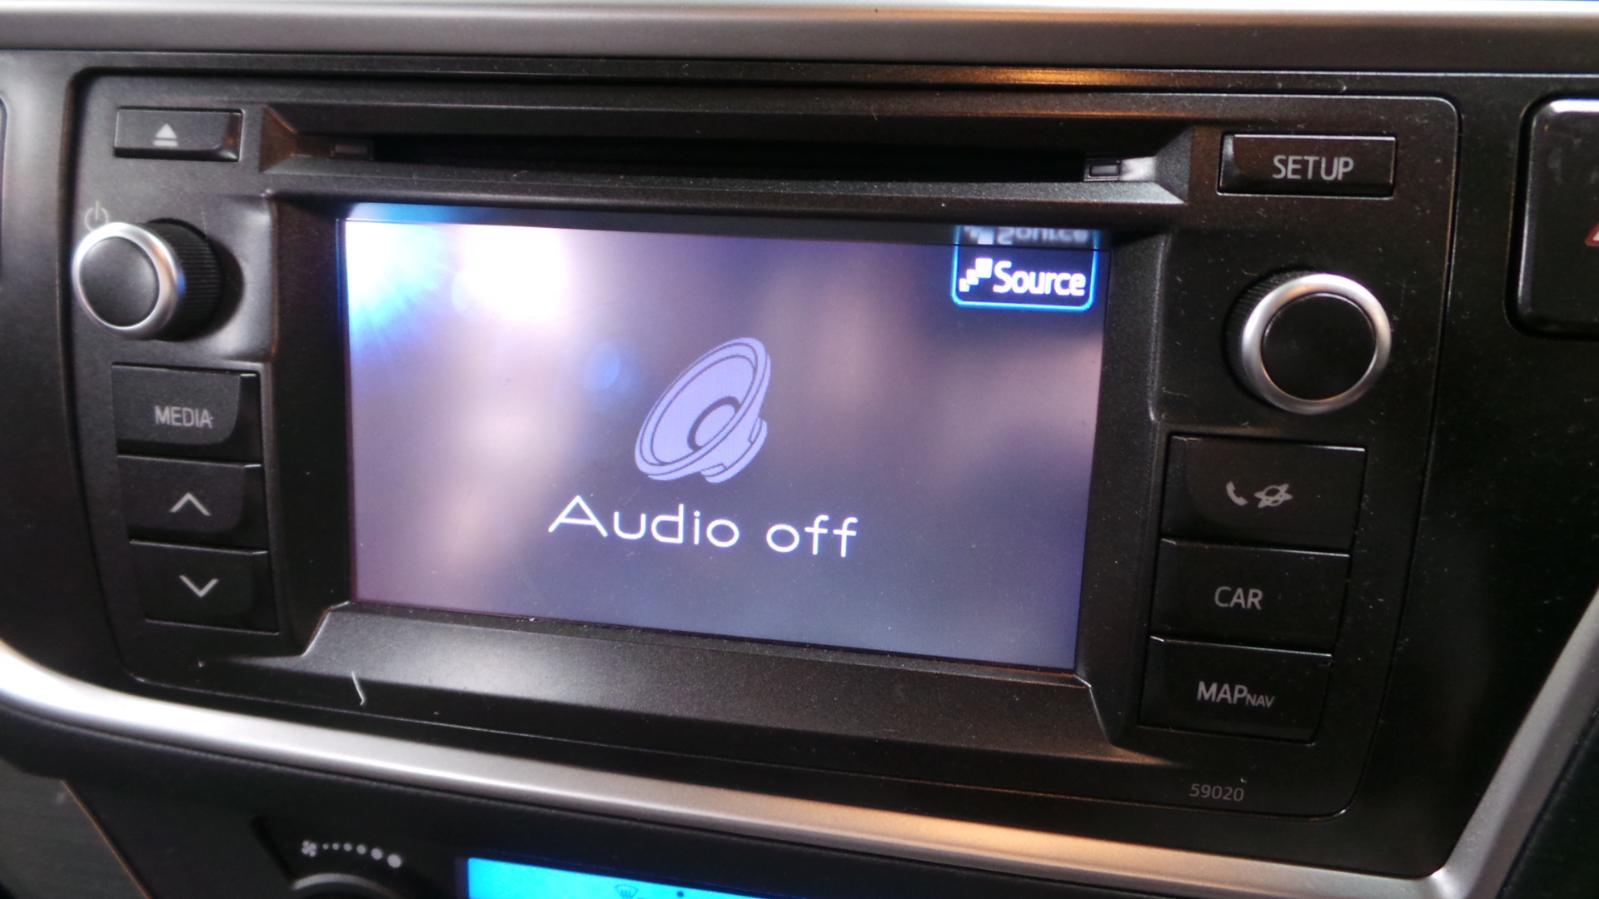 2013 Toyota Auris 2012 Sat Nav Radio Cd Player Head Unit